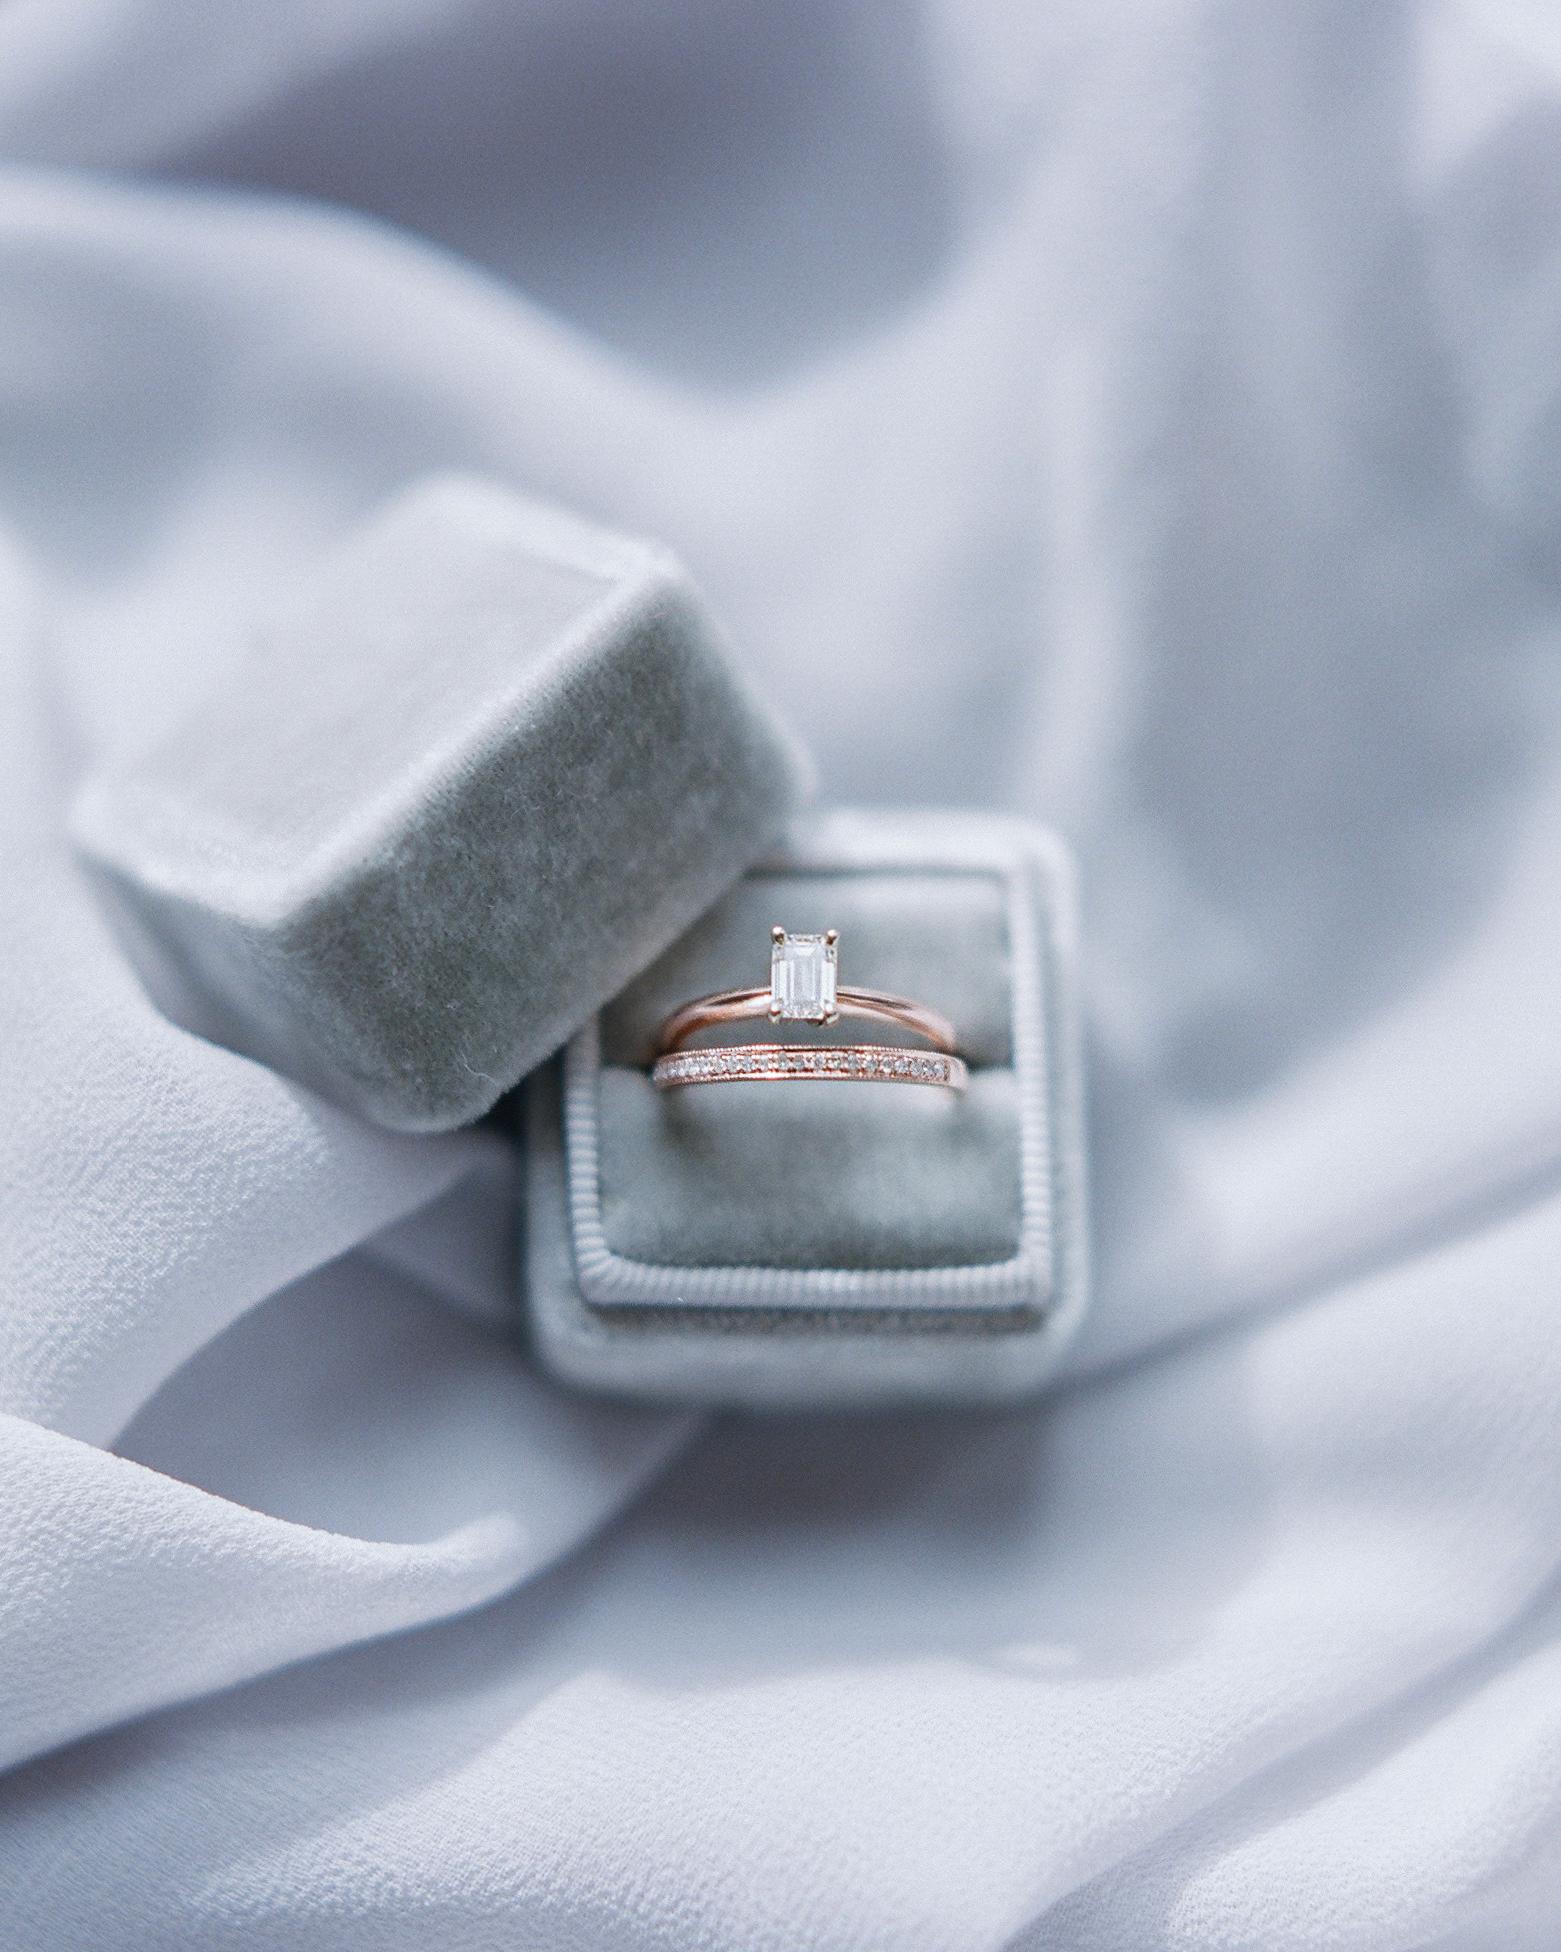 kendall-grant-wedding-ringbox-005-s112328-1215.jpg